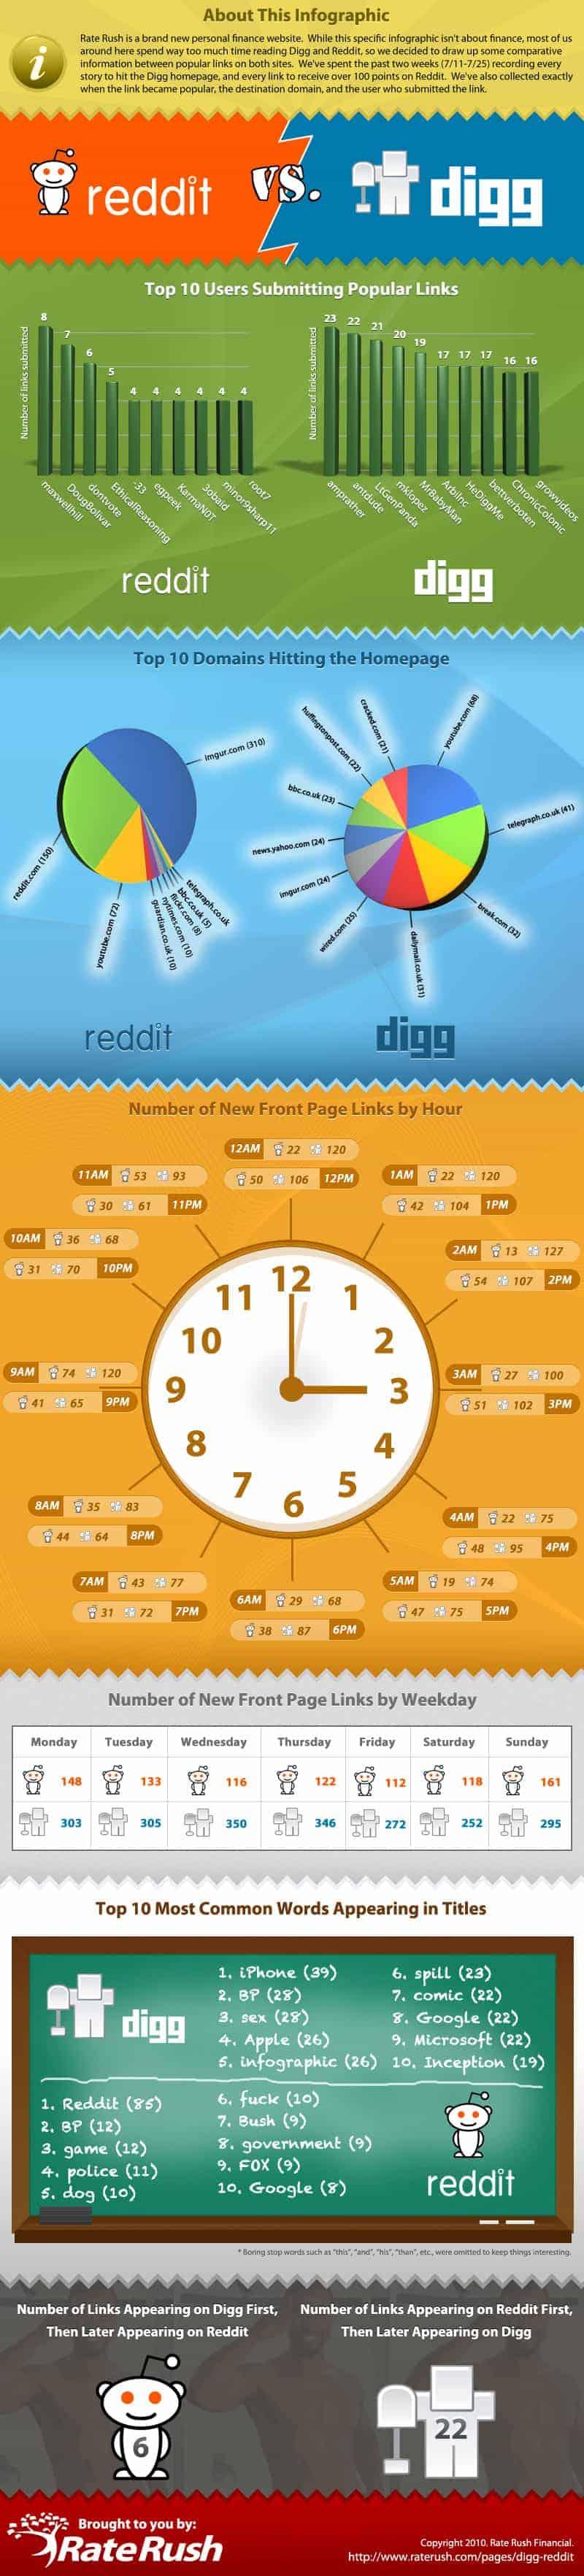 Reddit-Vs-Digg-Infographic